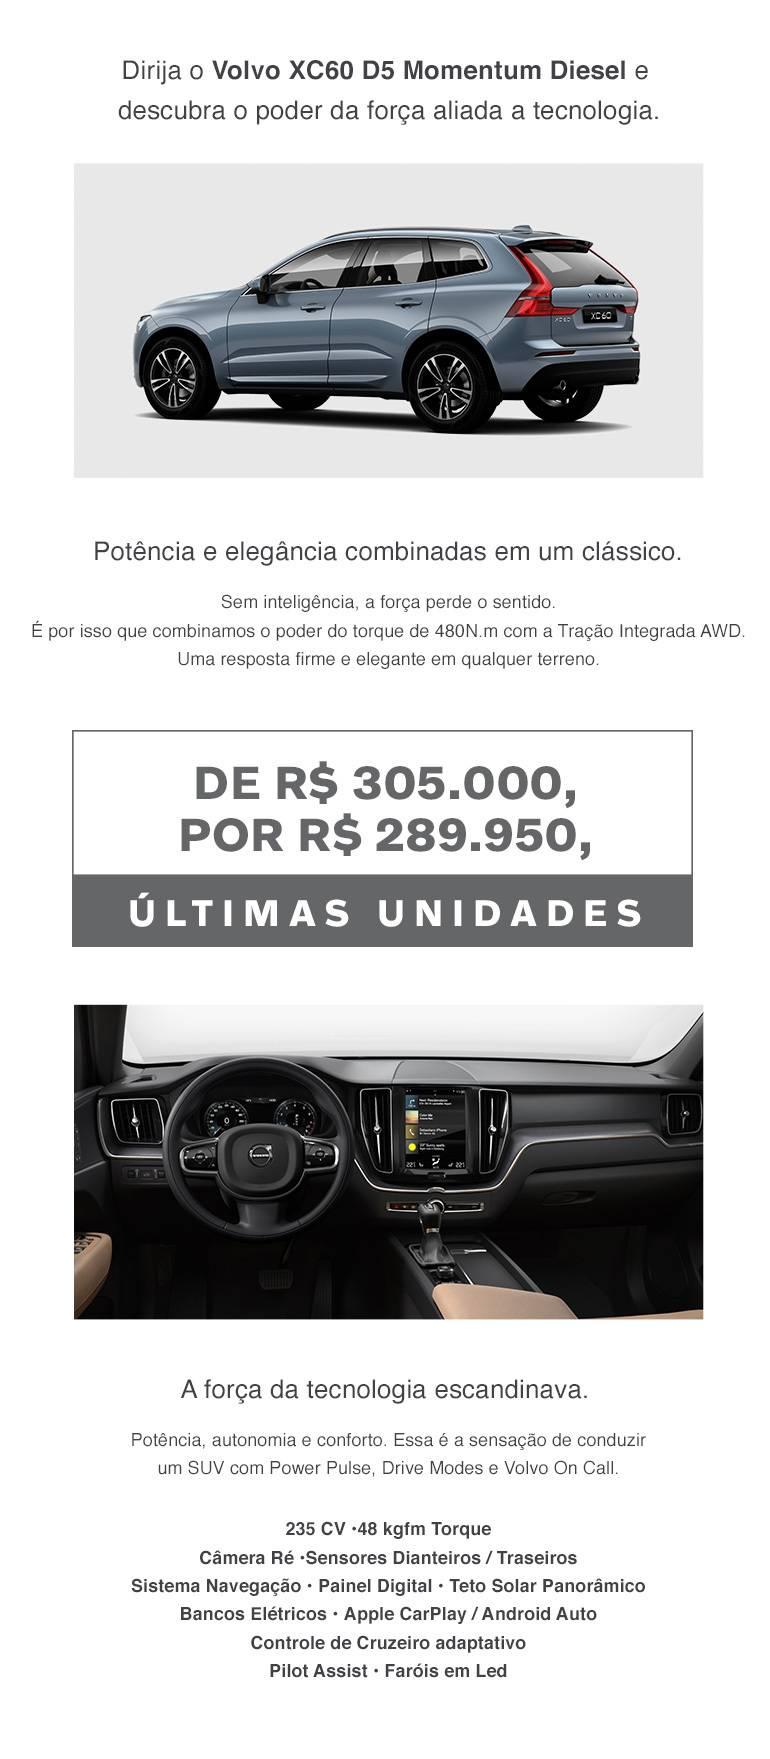 XC60 D5 Momentum Diesel